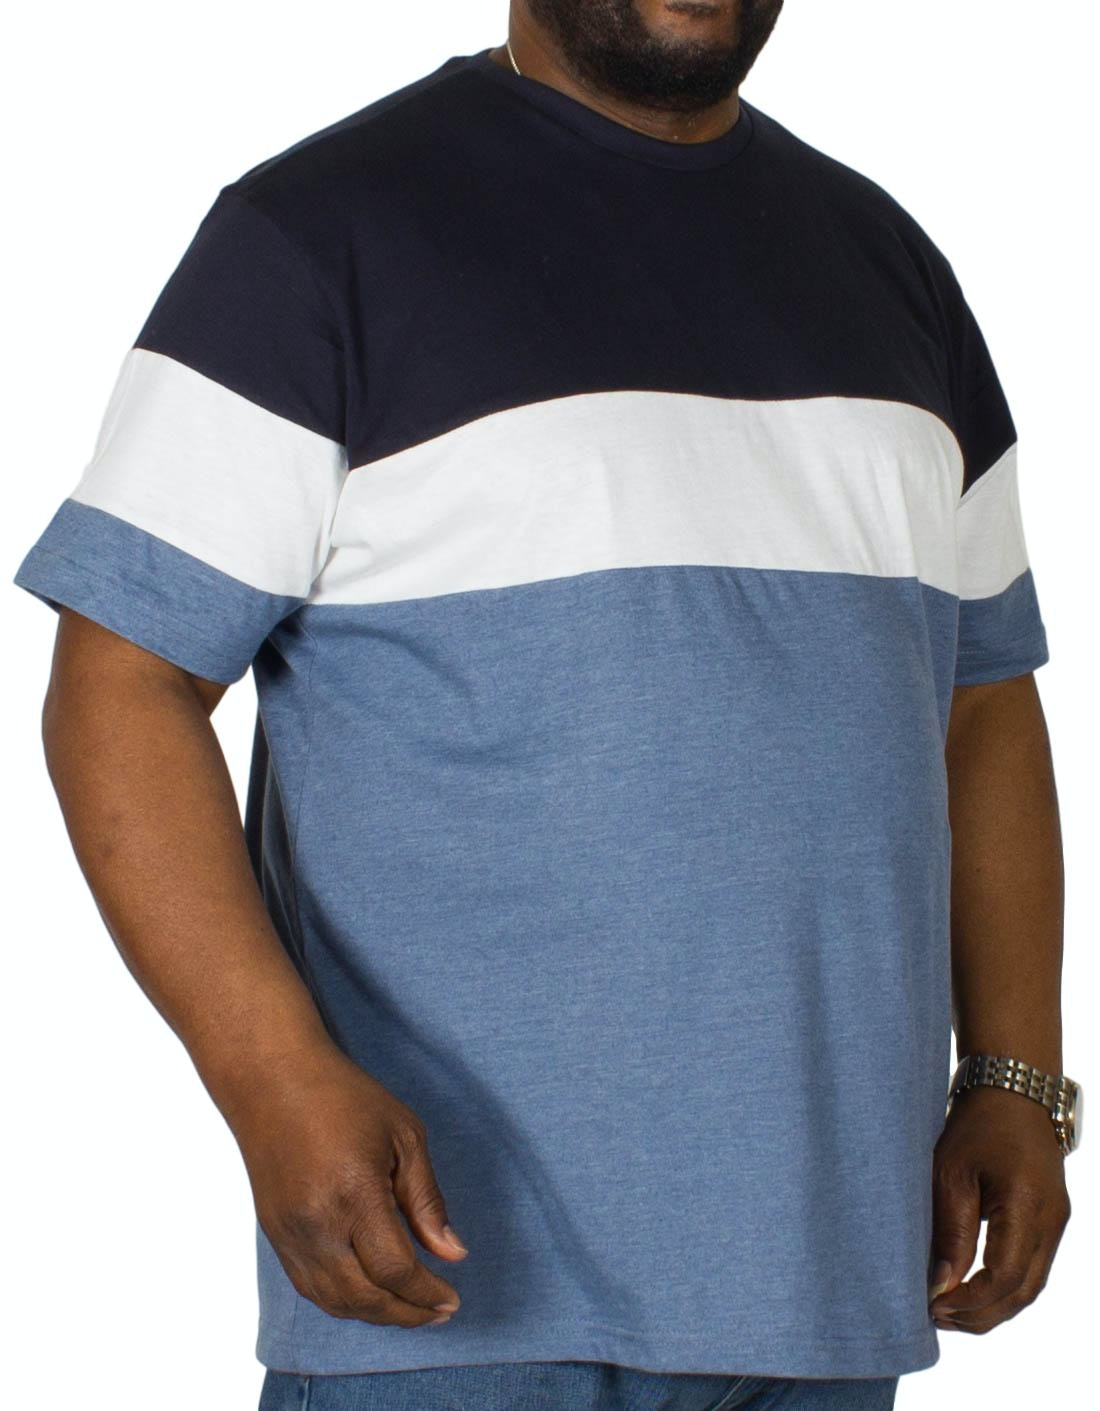 Bigdude Cut & Sew T-Shirt Navy/Denim